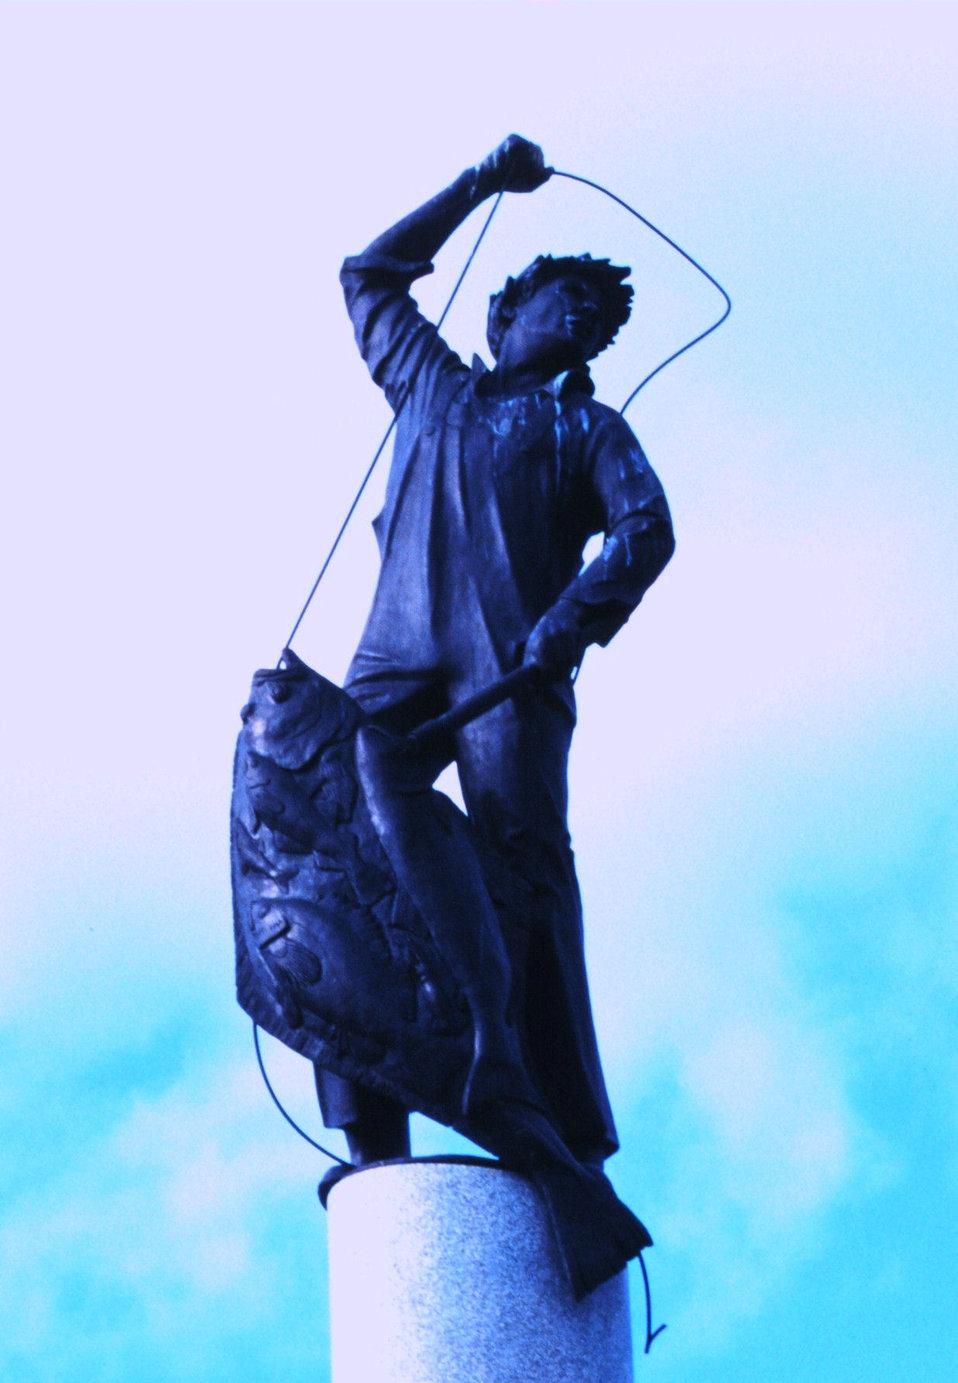 Statue of halibut fisherman adorning top of Seattle's Fishermen's Memorial